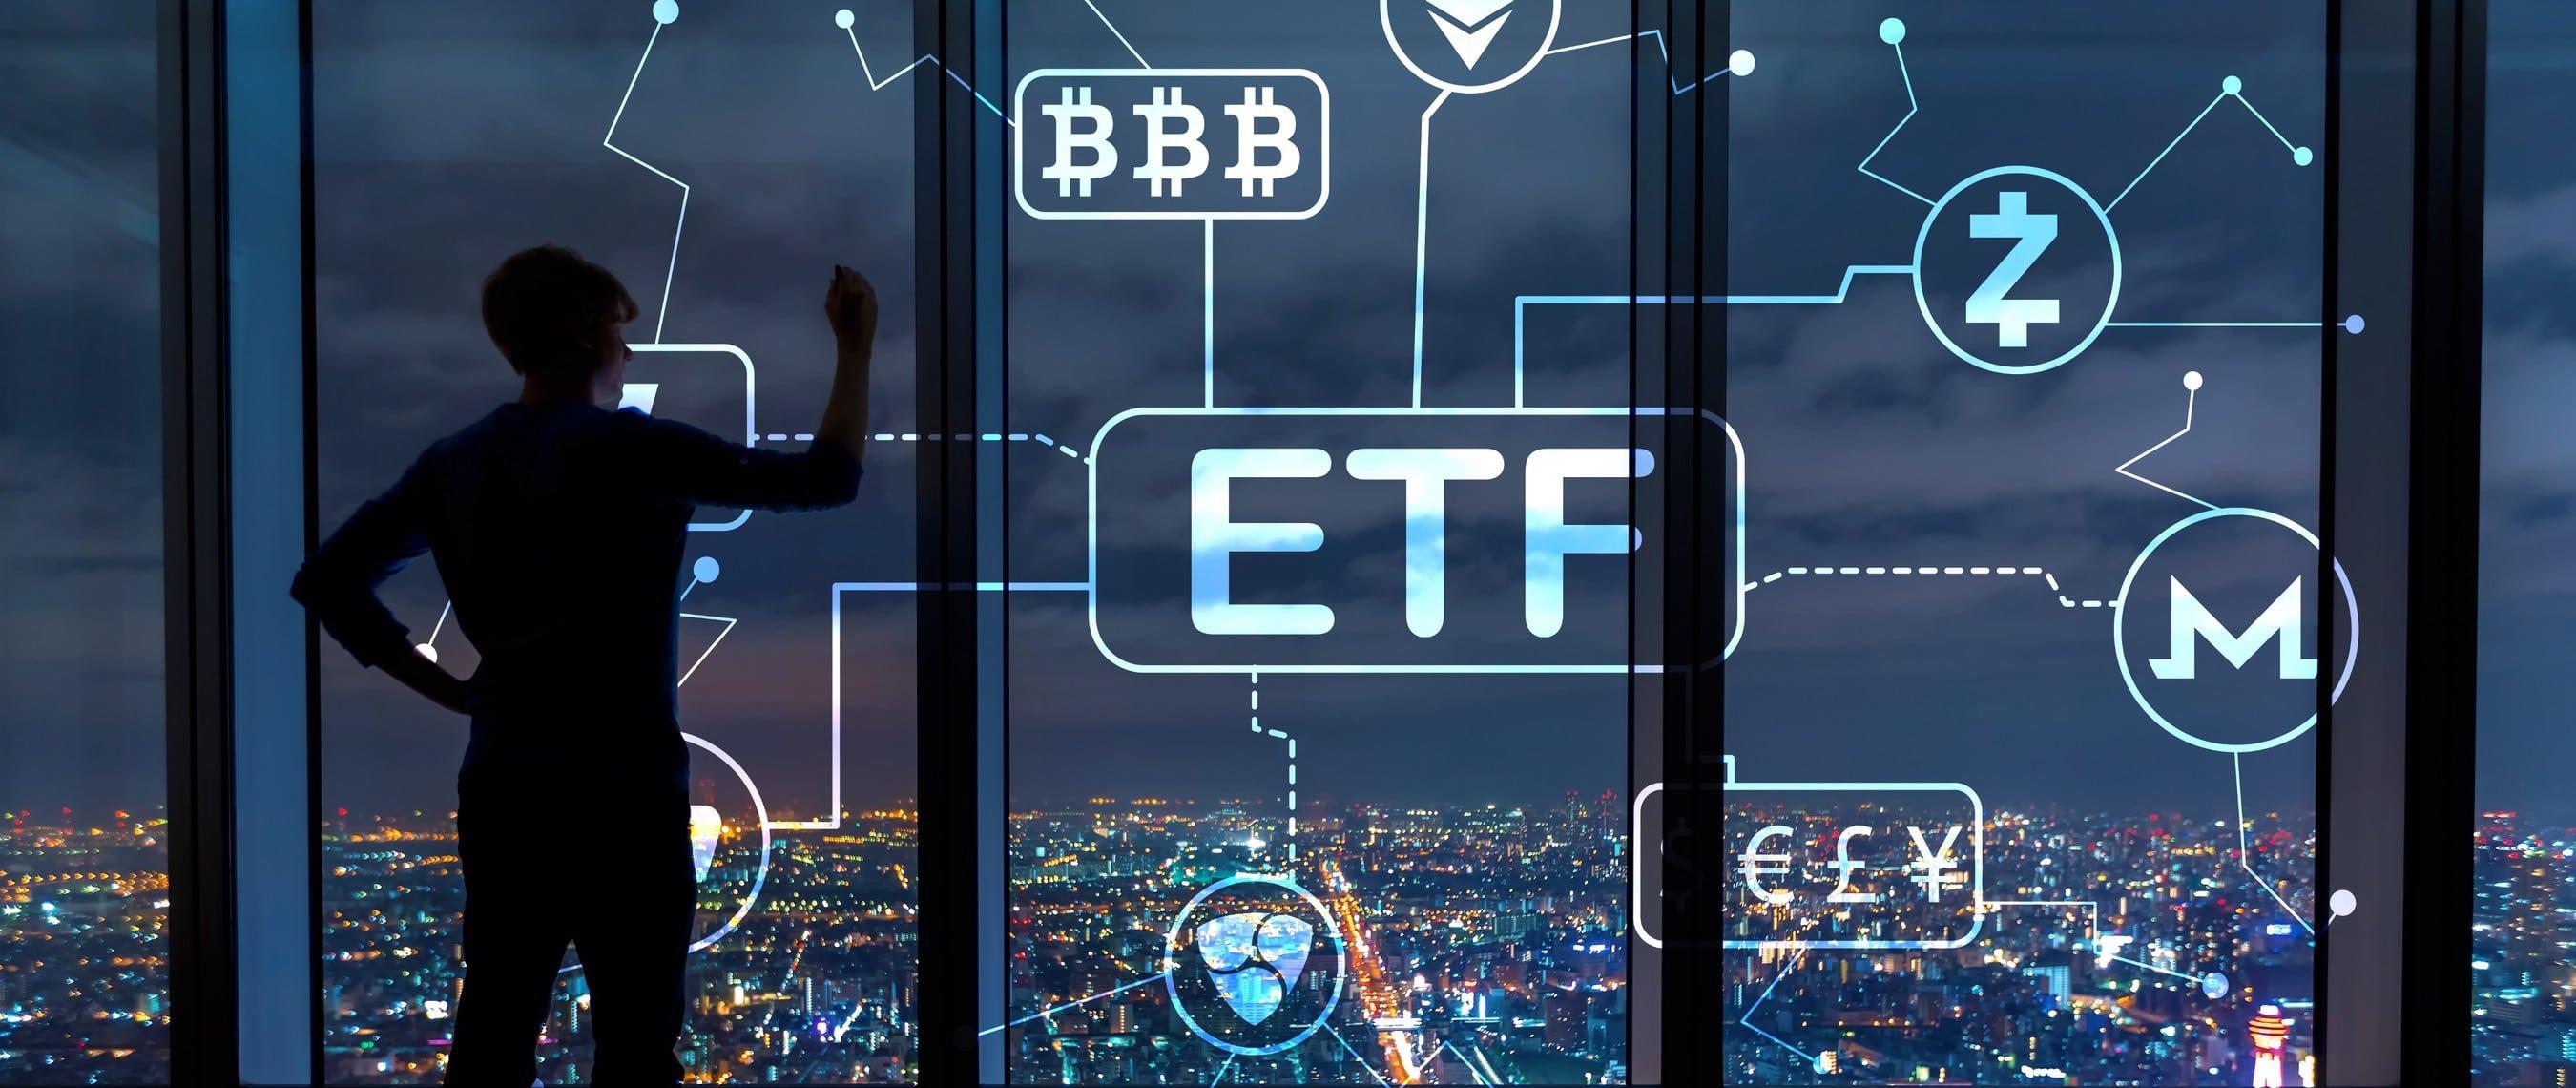 Bitcoin ETF Kryptowährungen